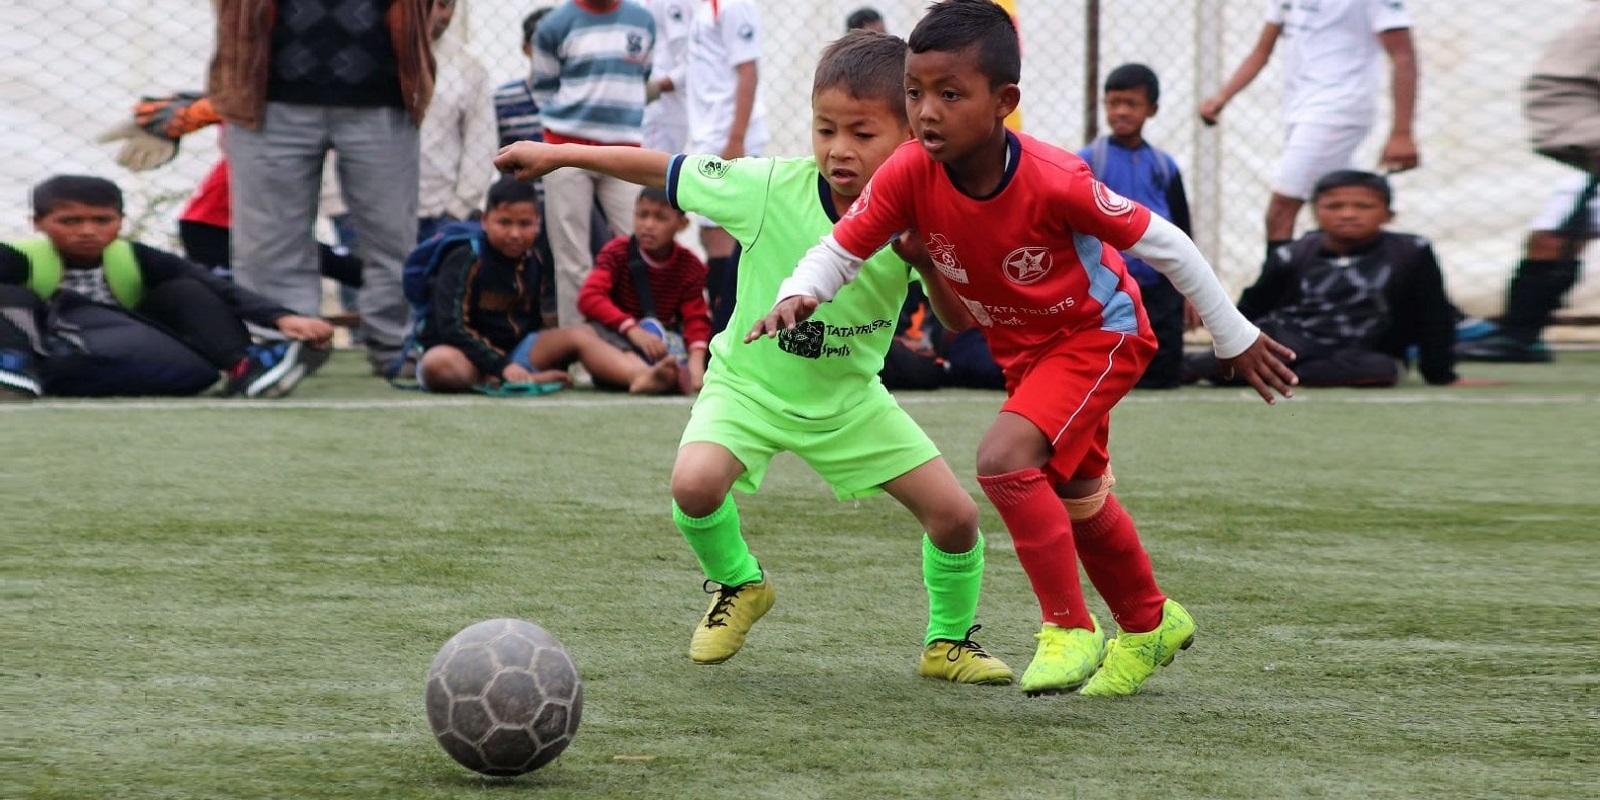 Greater Guwahati Baby League